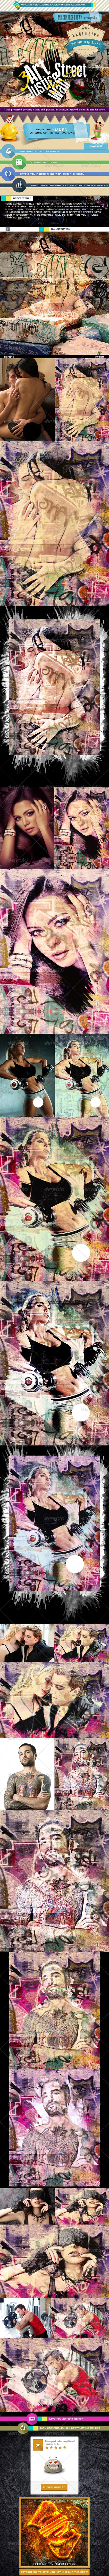 GraphicRiver Art Justice Graffiti 3 Urban Street of New York 8386677